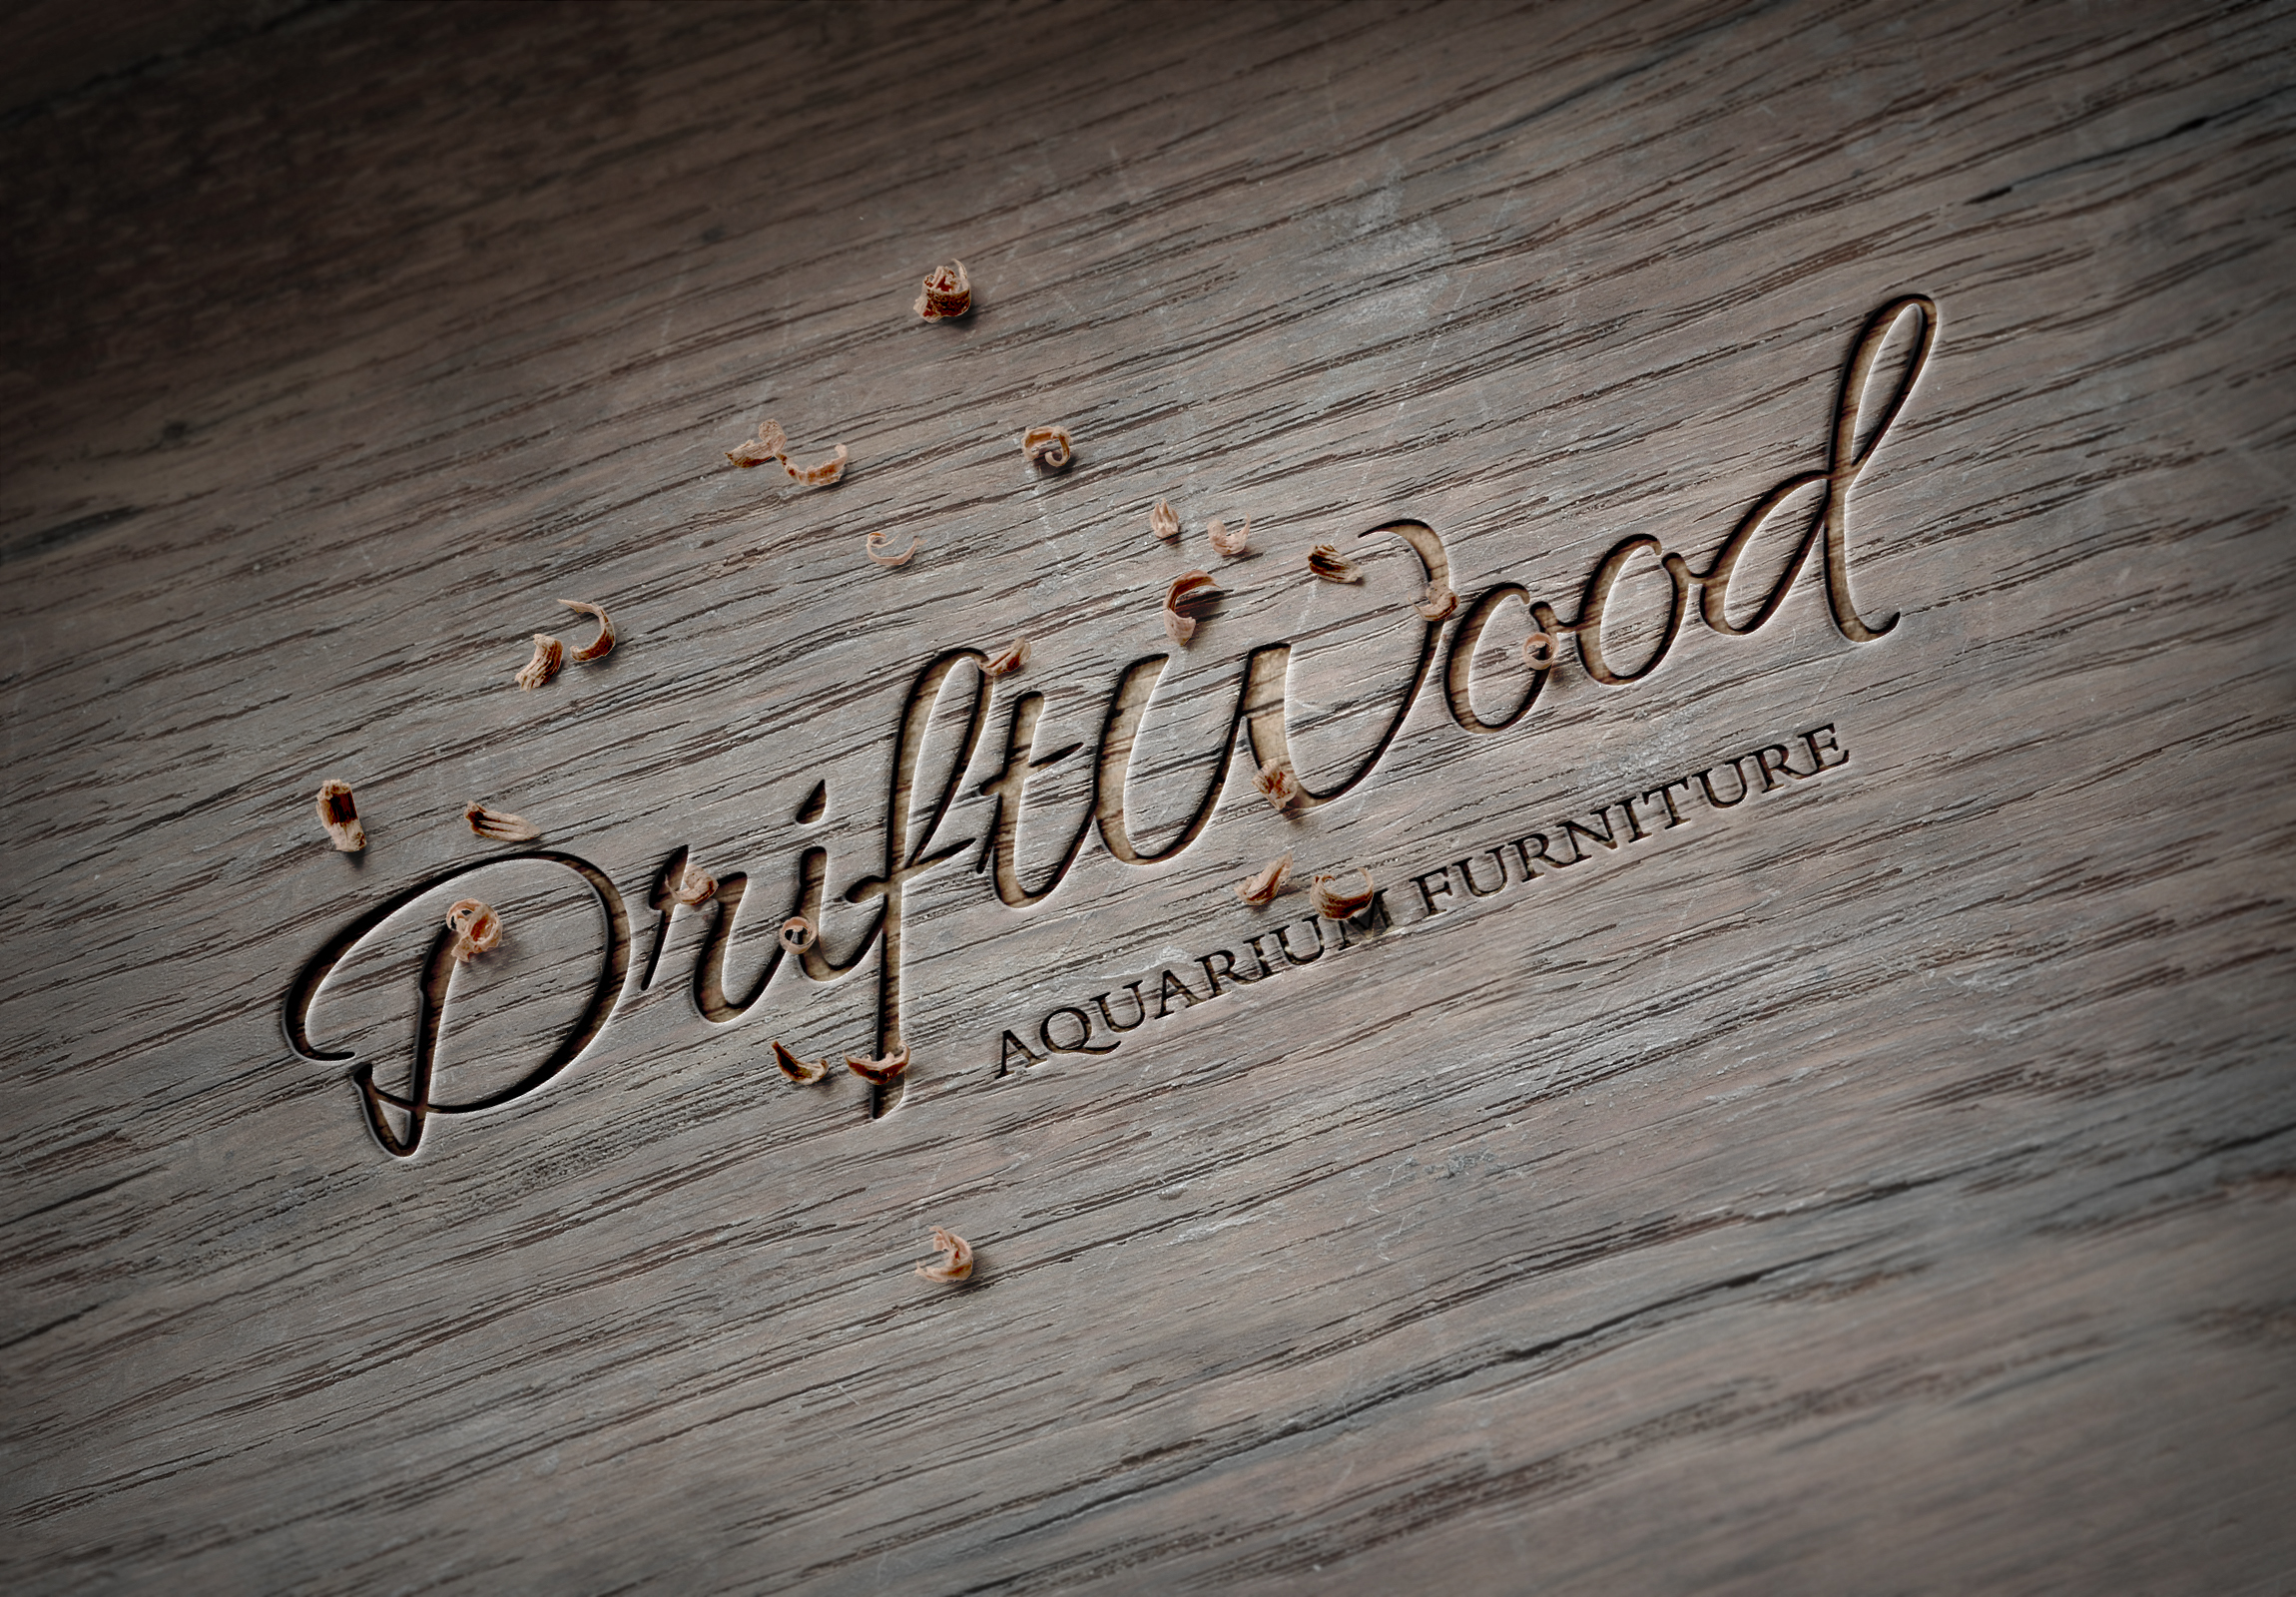 Drift Wood Aquarium Furniture